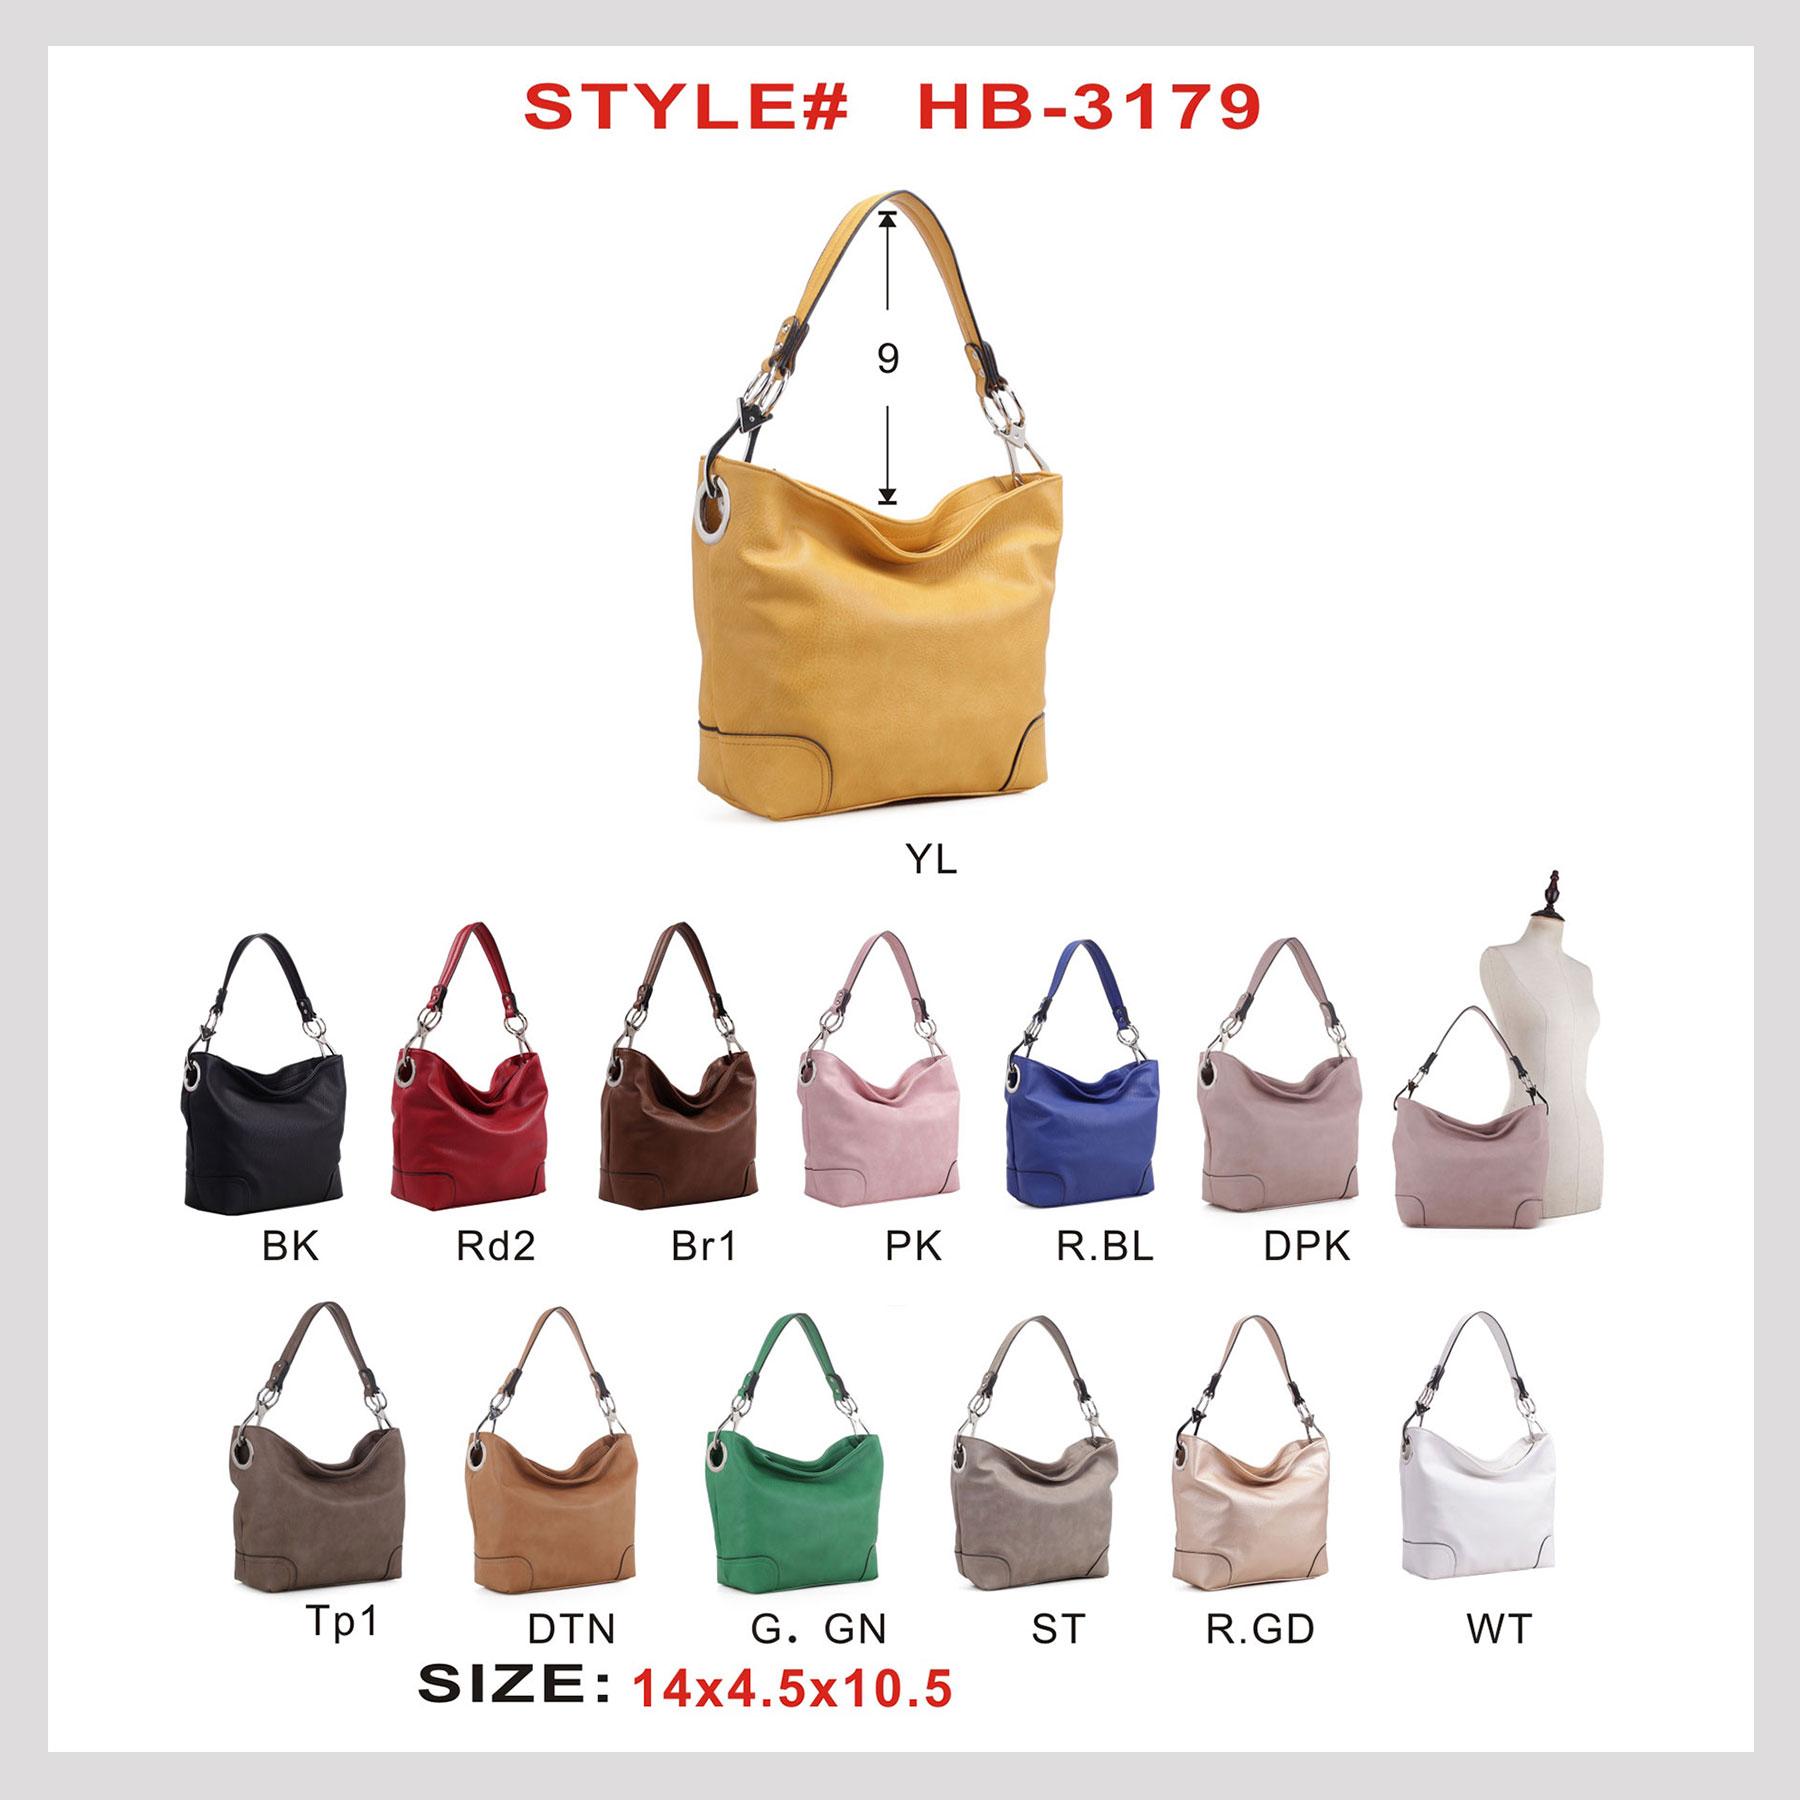 HB-3179.jpg